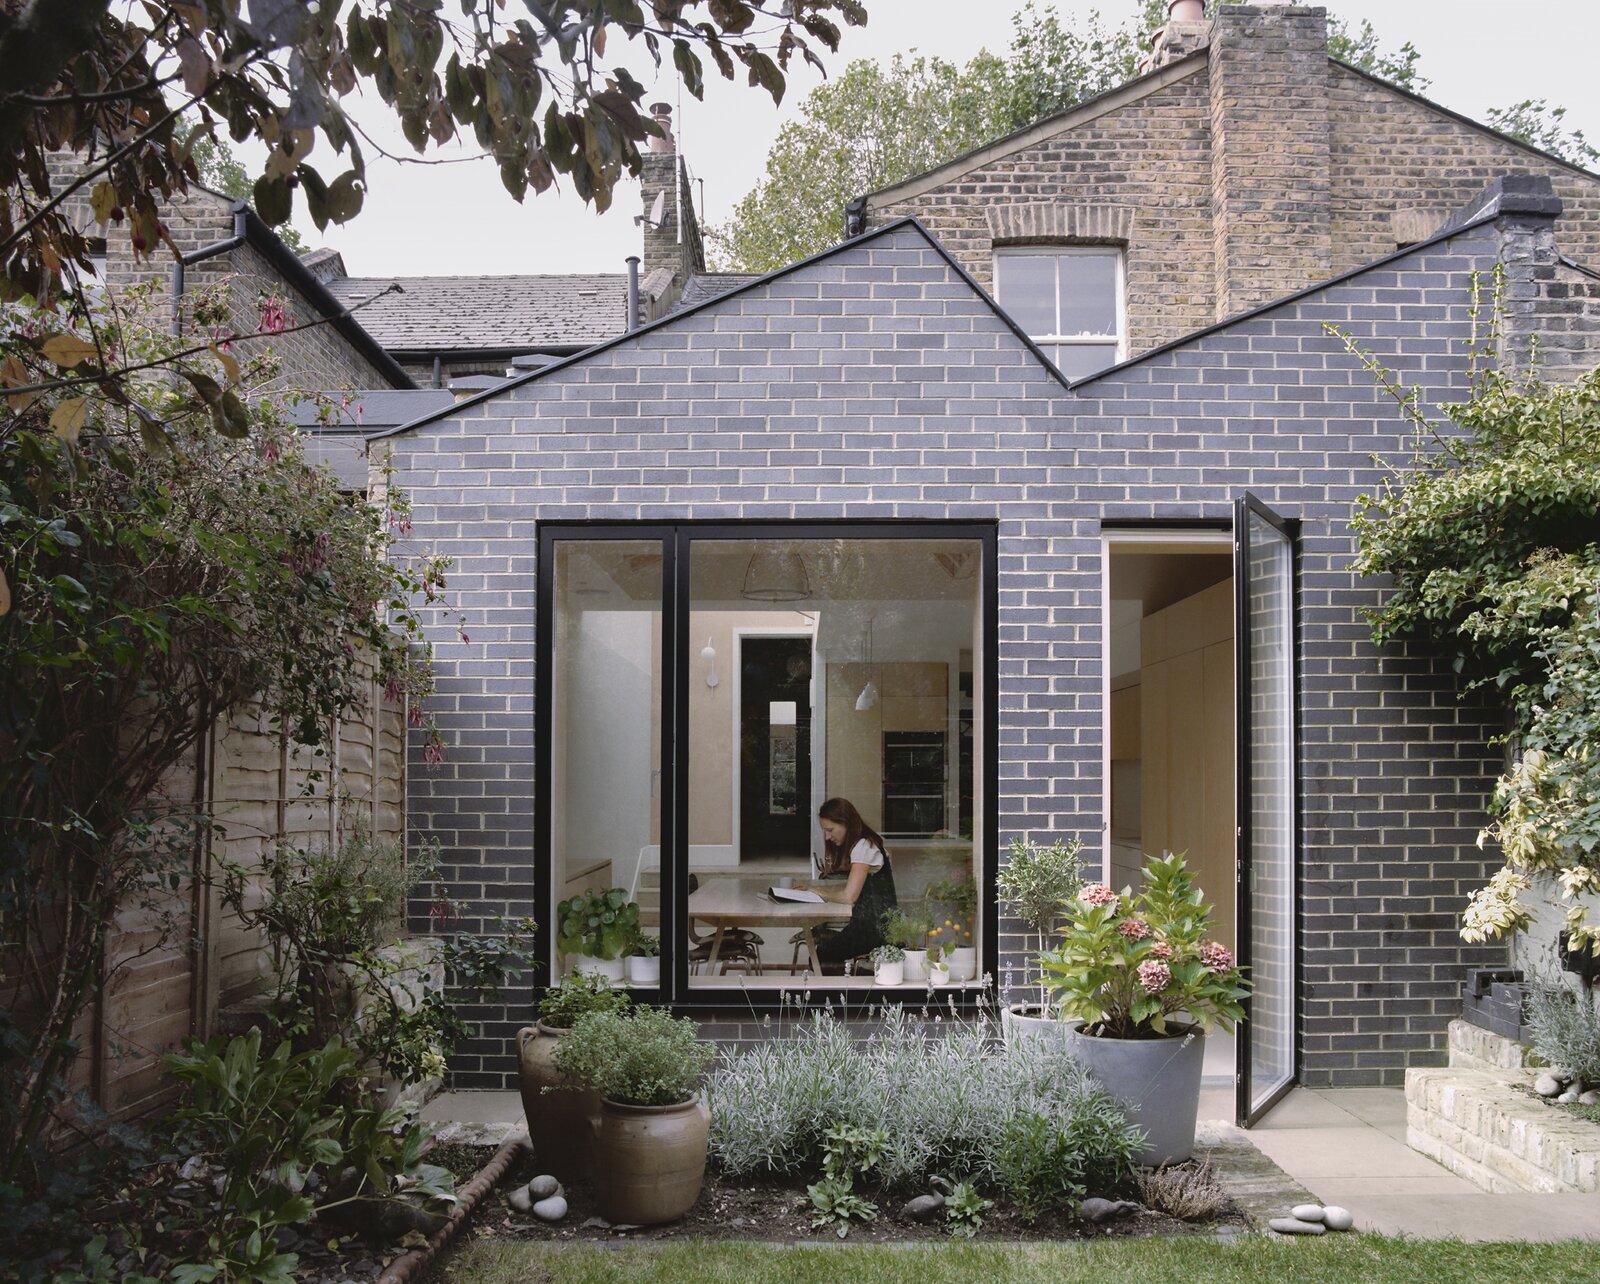 zigzag roof exterior of kitchen extension